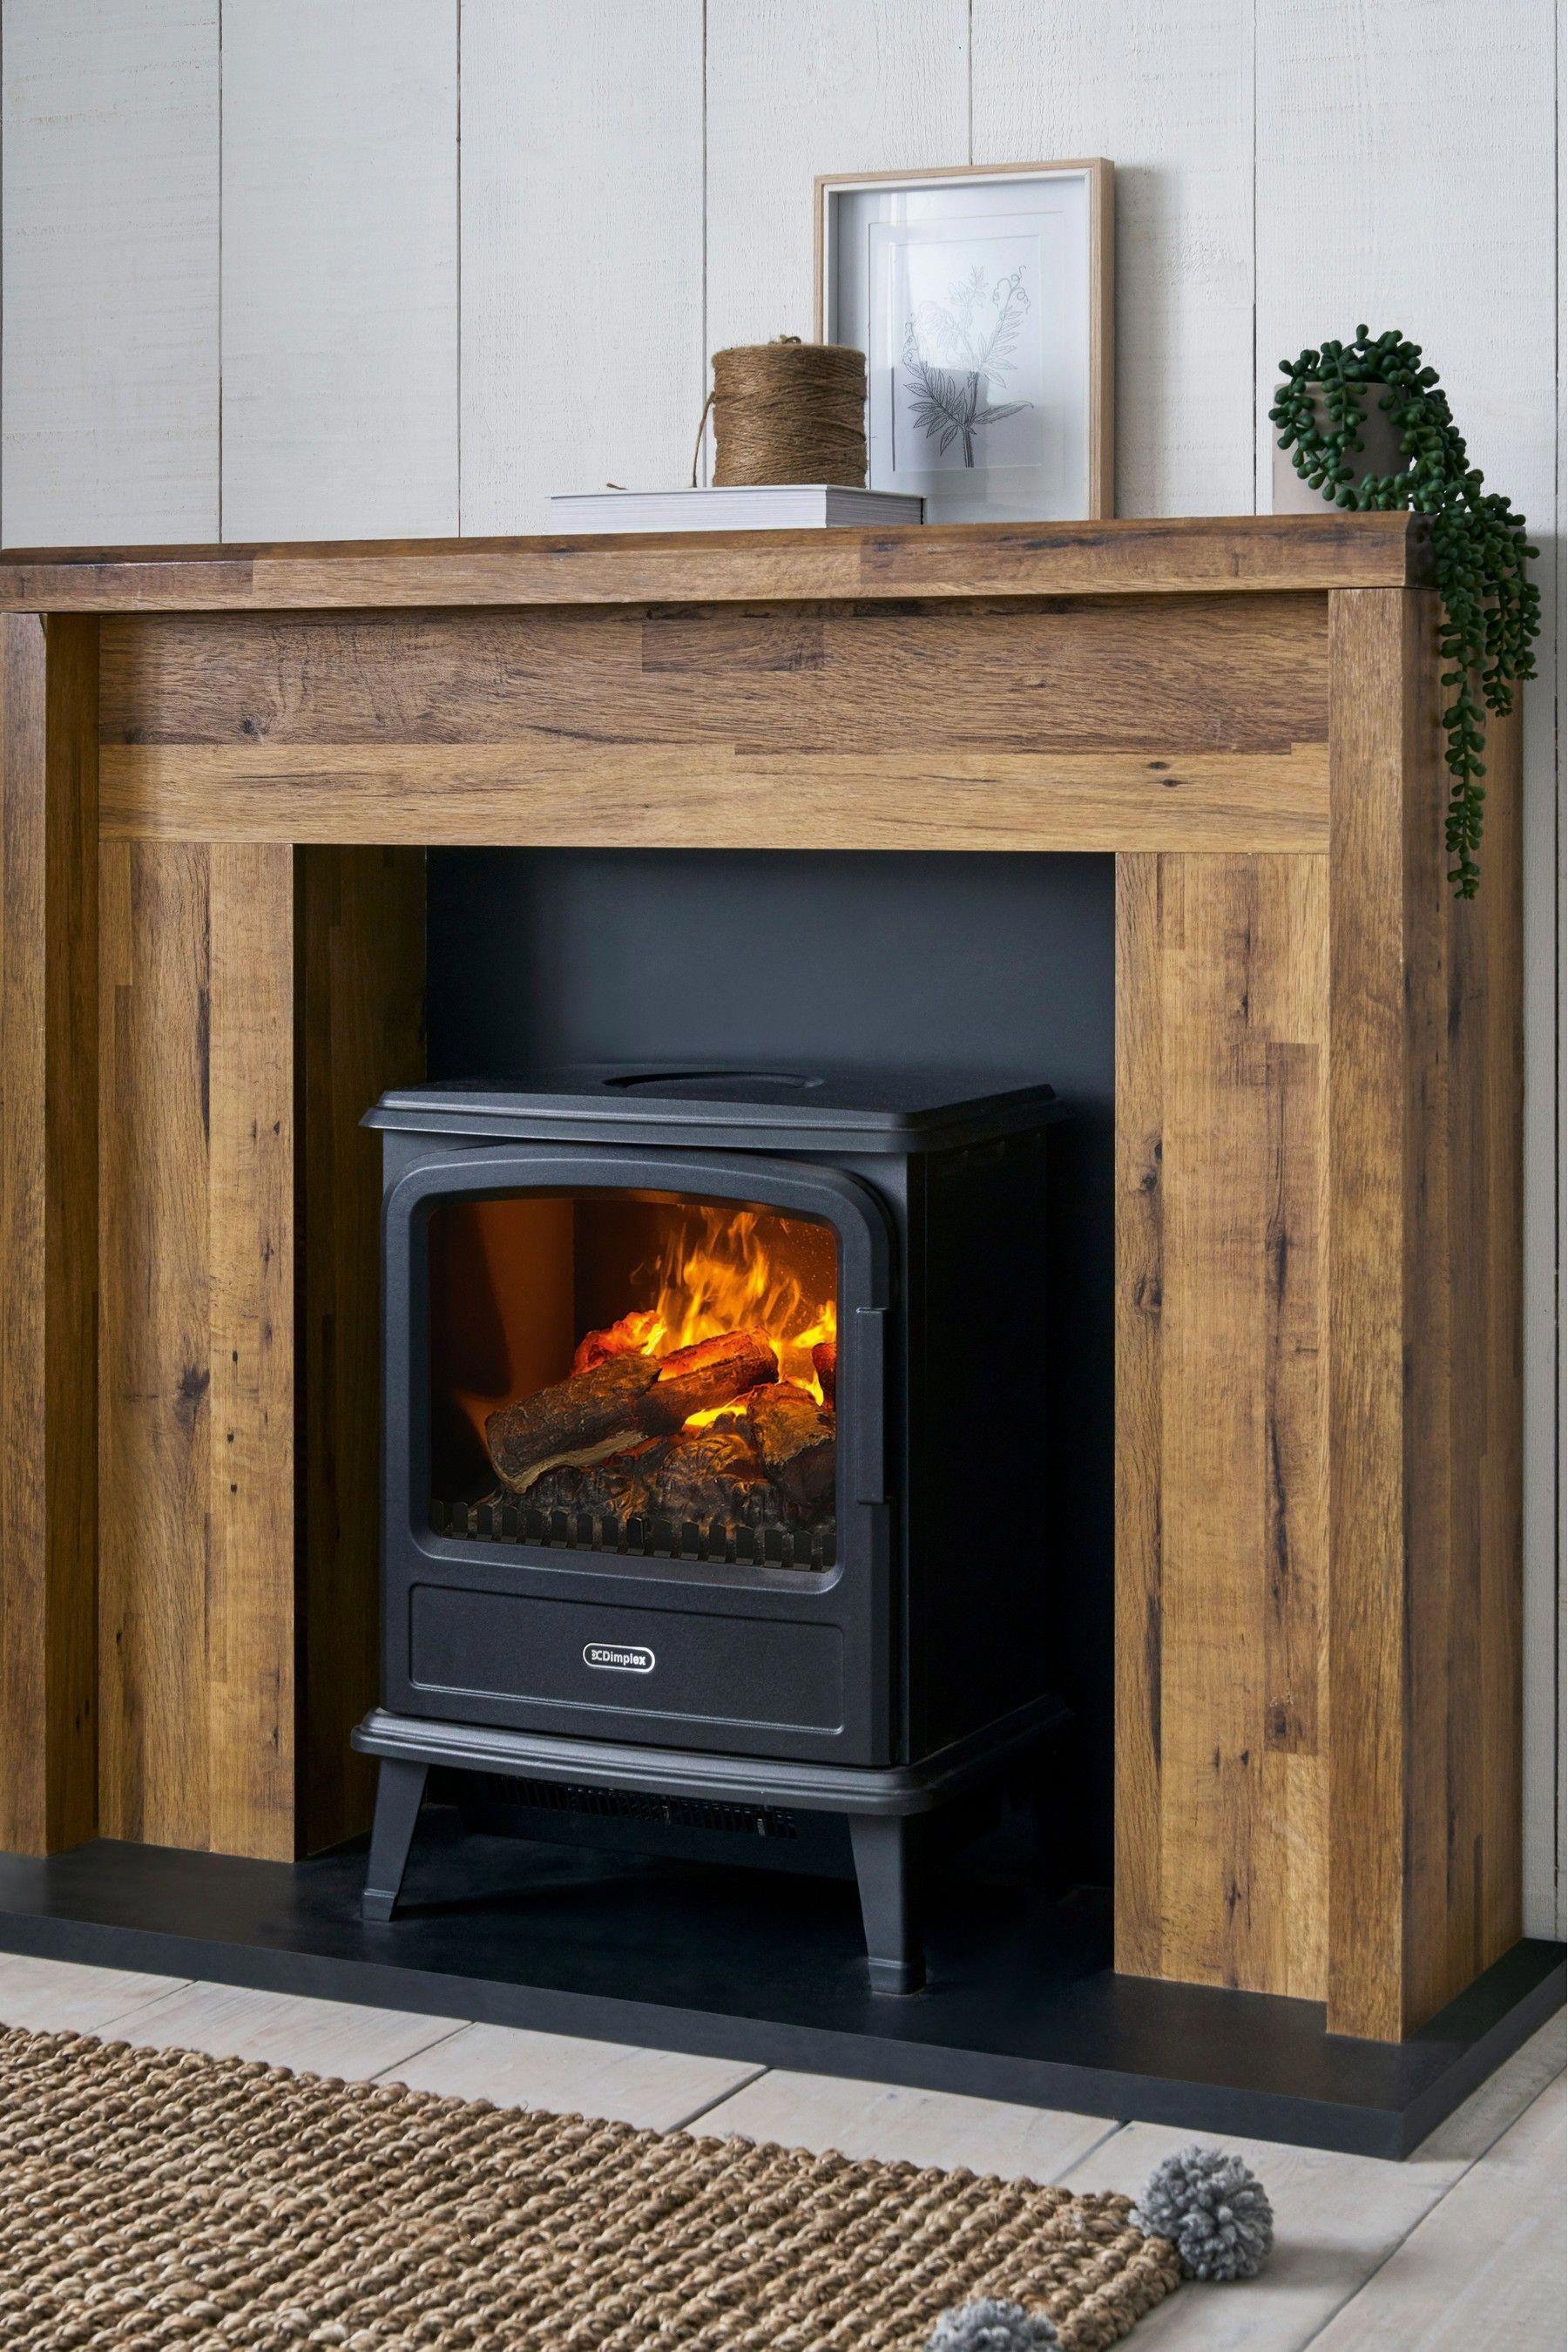 Next Bronx Fireplace Surround   Natural chimneydecorlivingroom ...